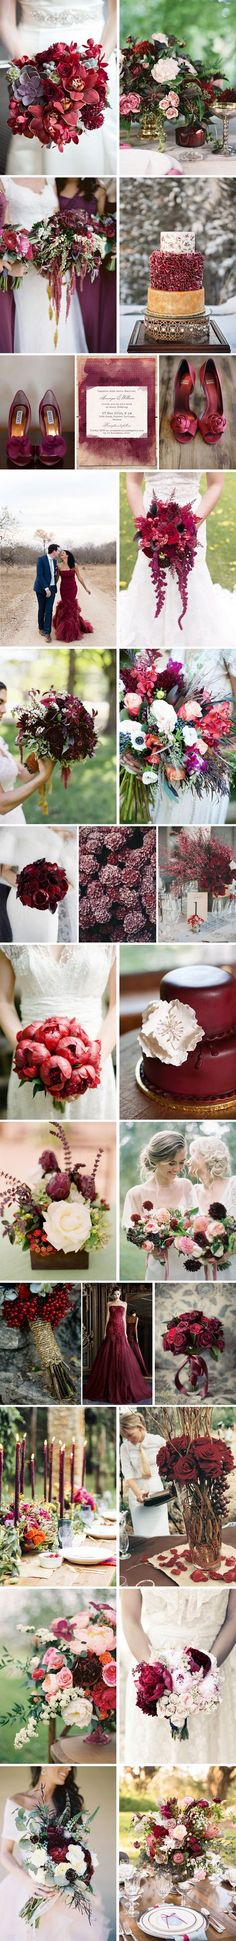 pantone color of 2015 marsala wedding inspiration